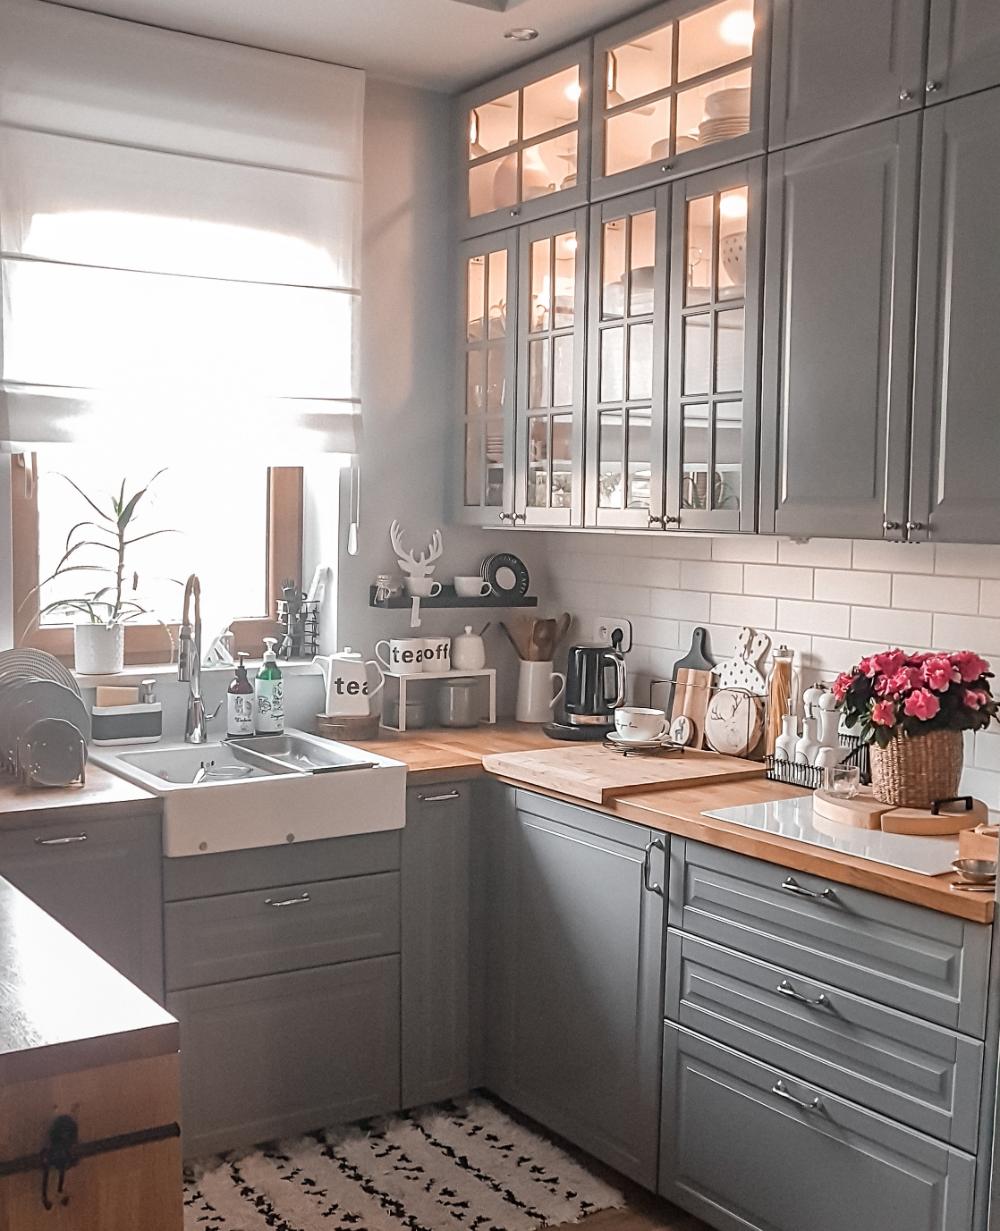 Kuchnia Z Oknem Pomysl Na Aranzacje Ih Internity Home Kitchen Remodel Small Kitchen Inspiration Design Galley Kitchen Design